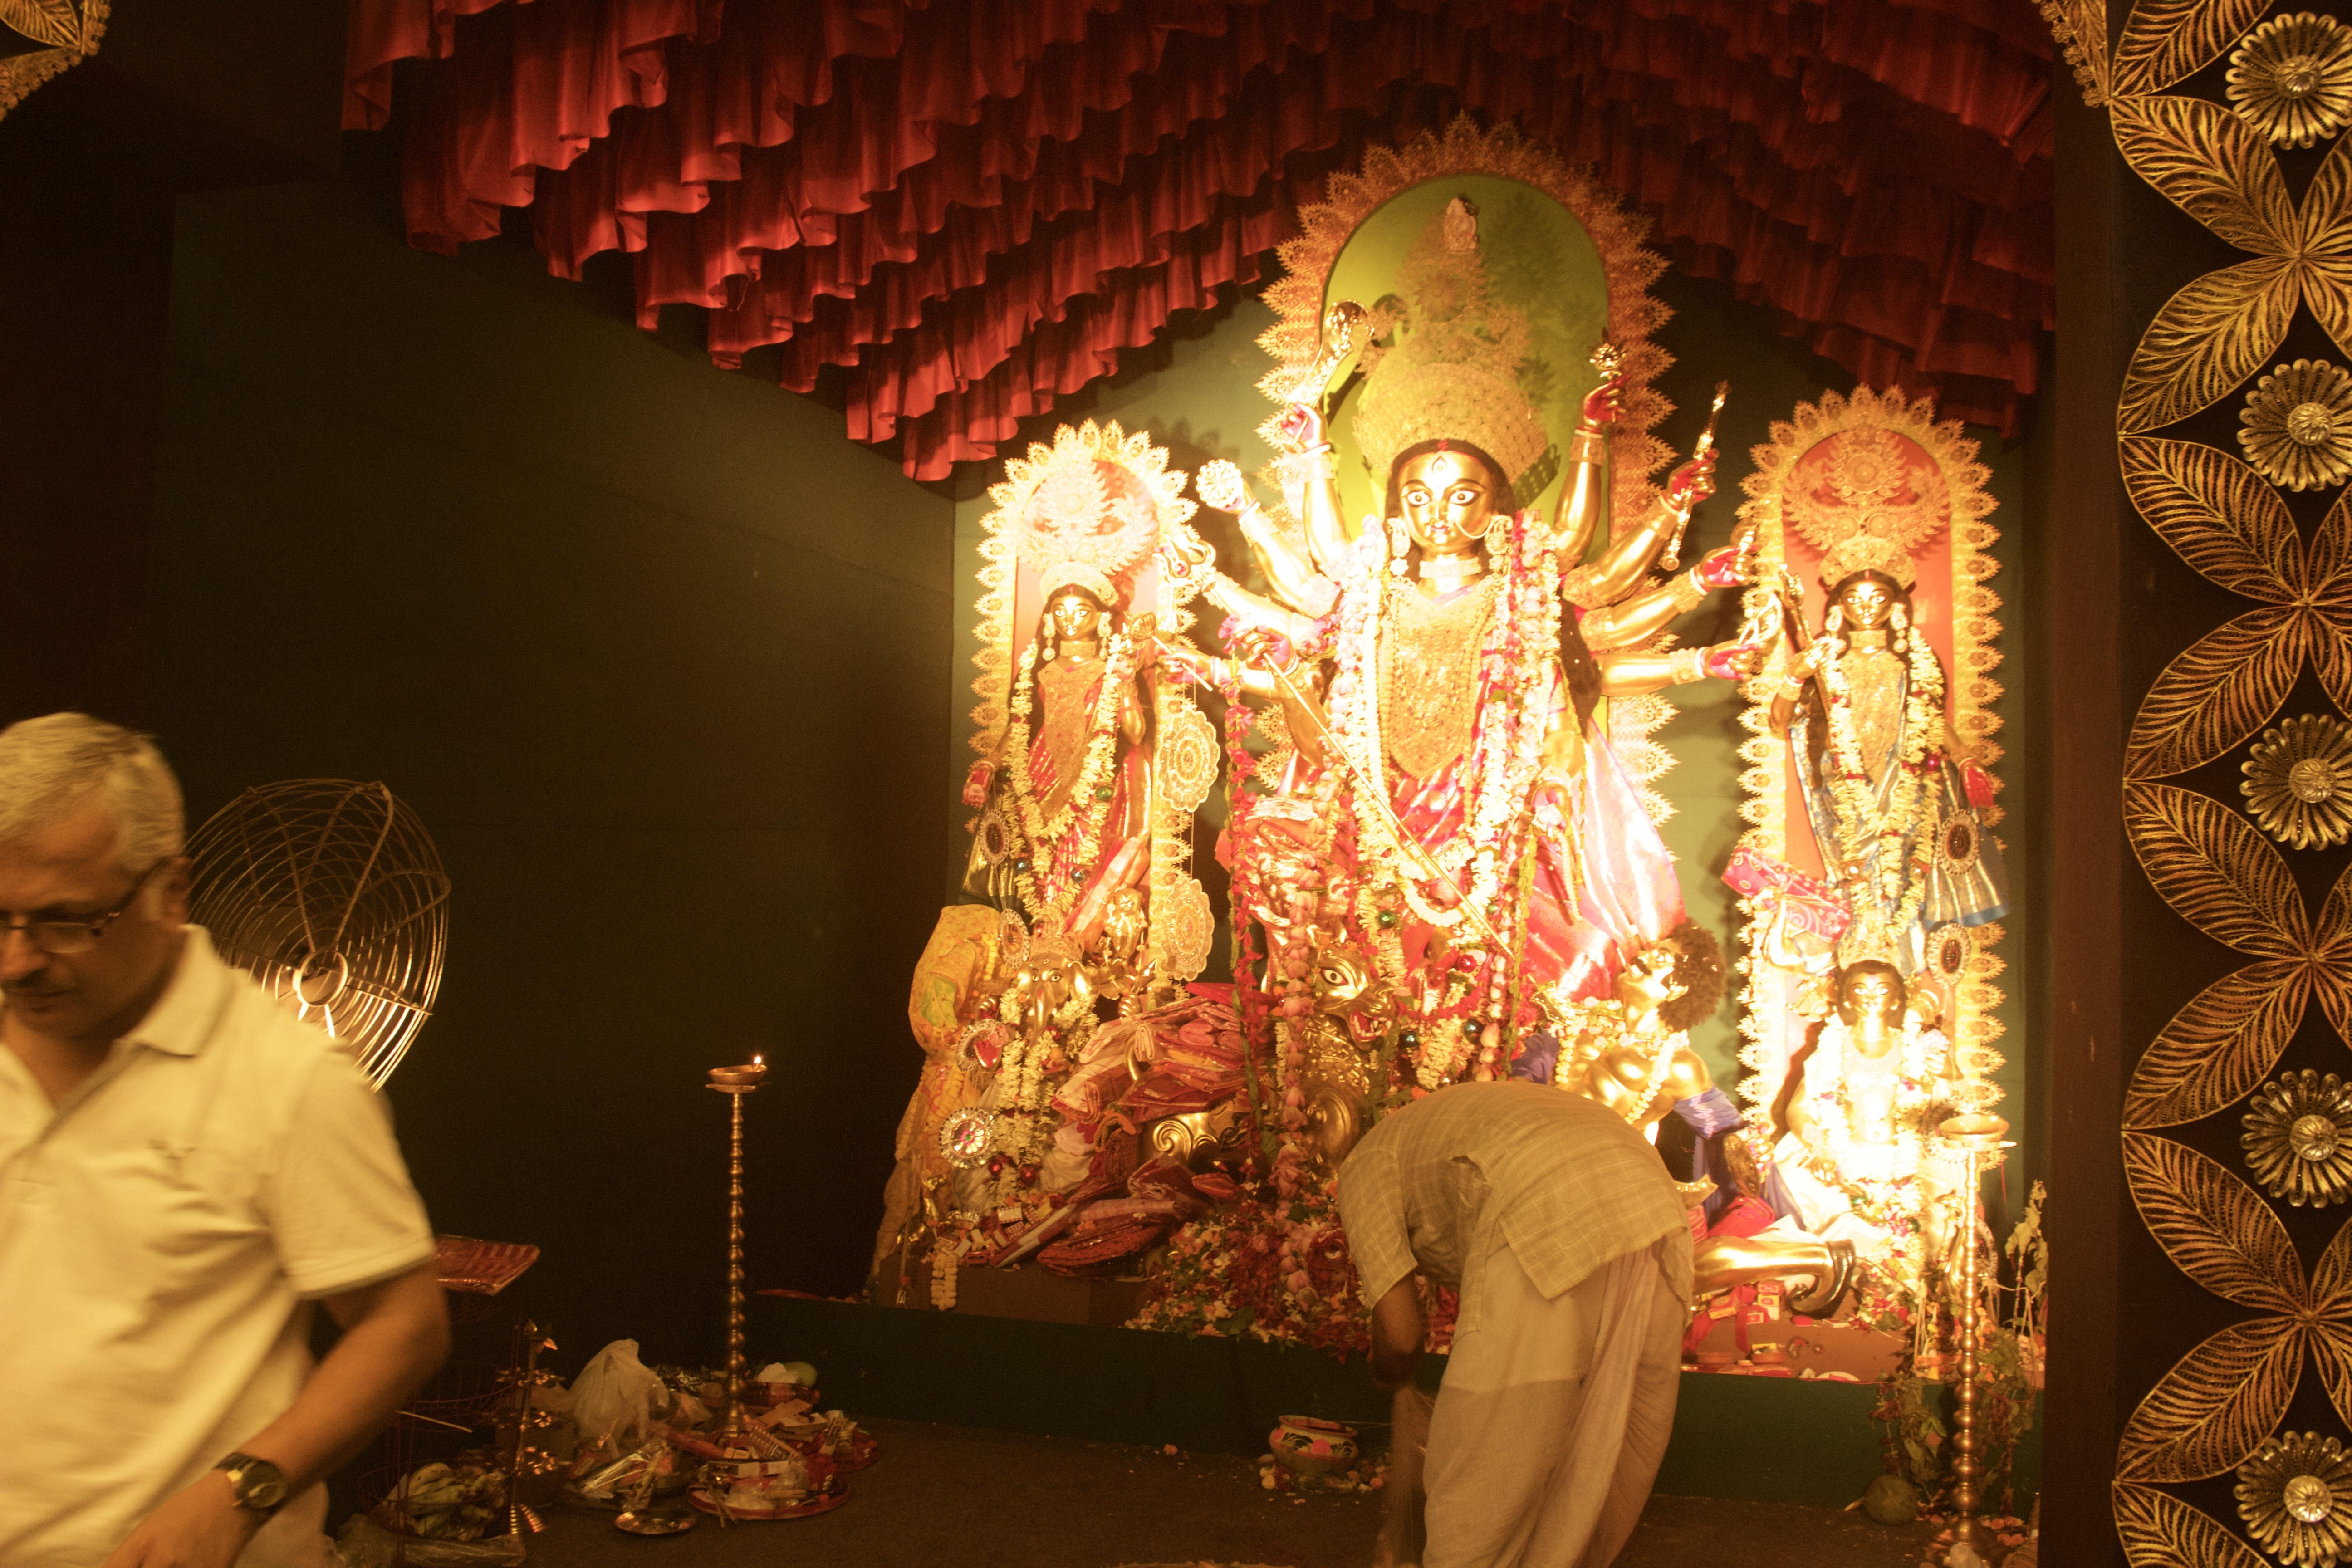 One of the Pandal's - Goddess Durga